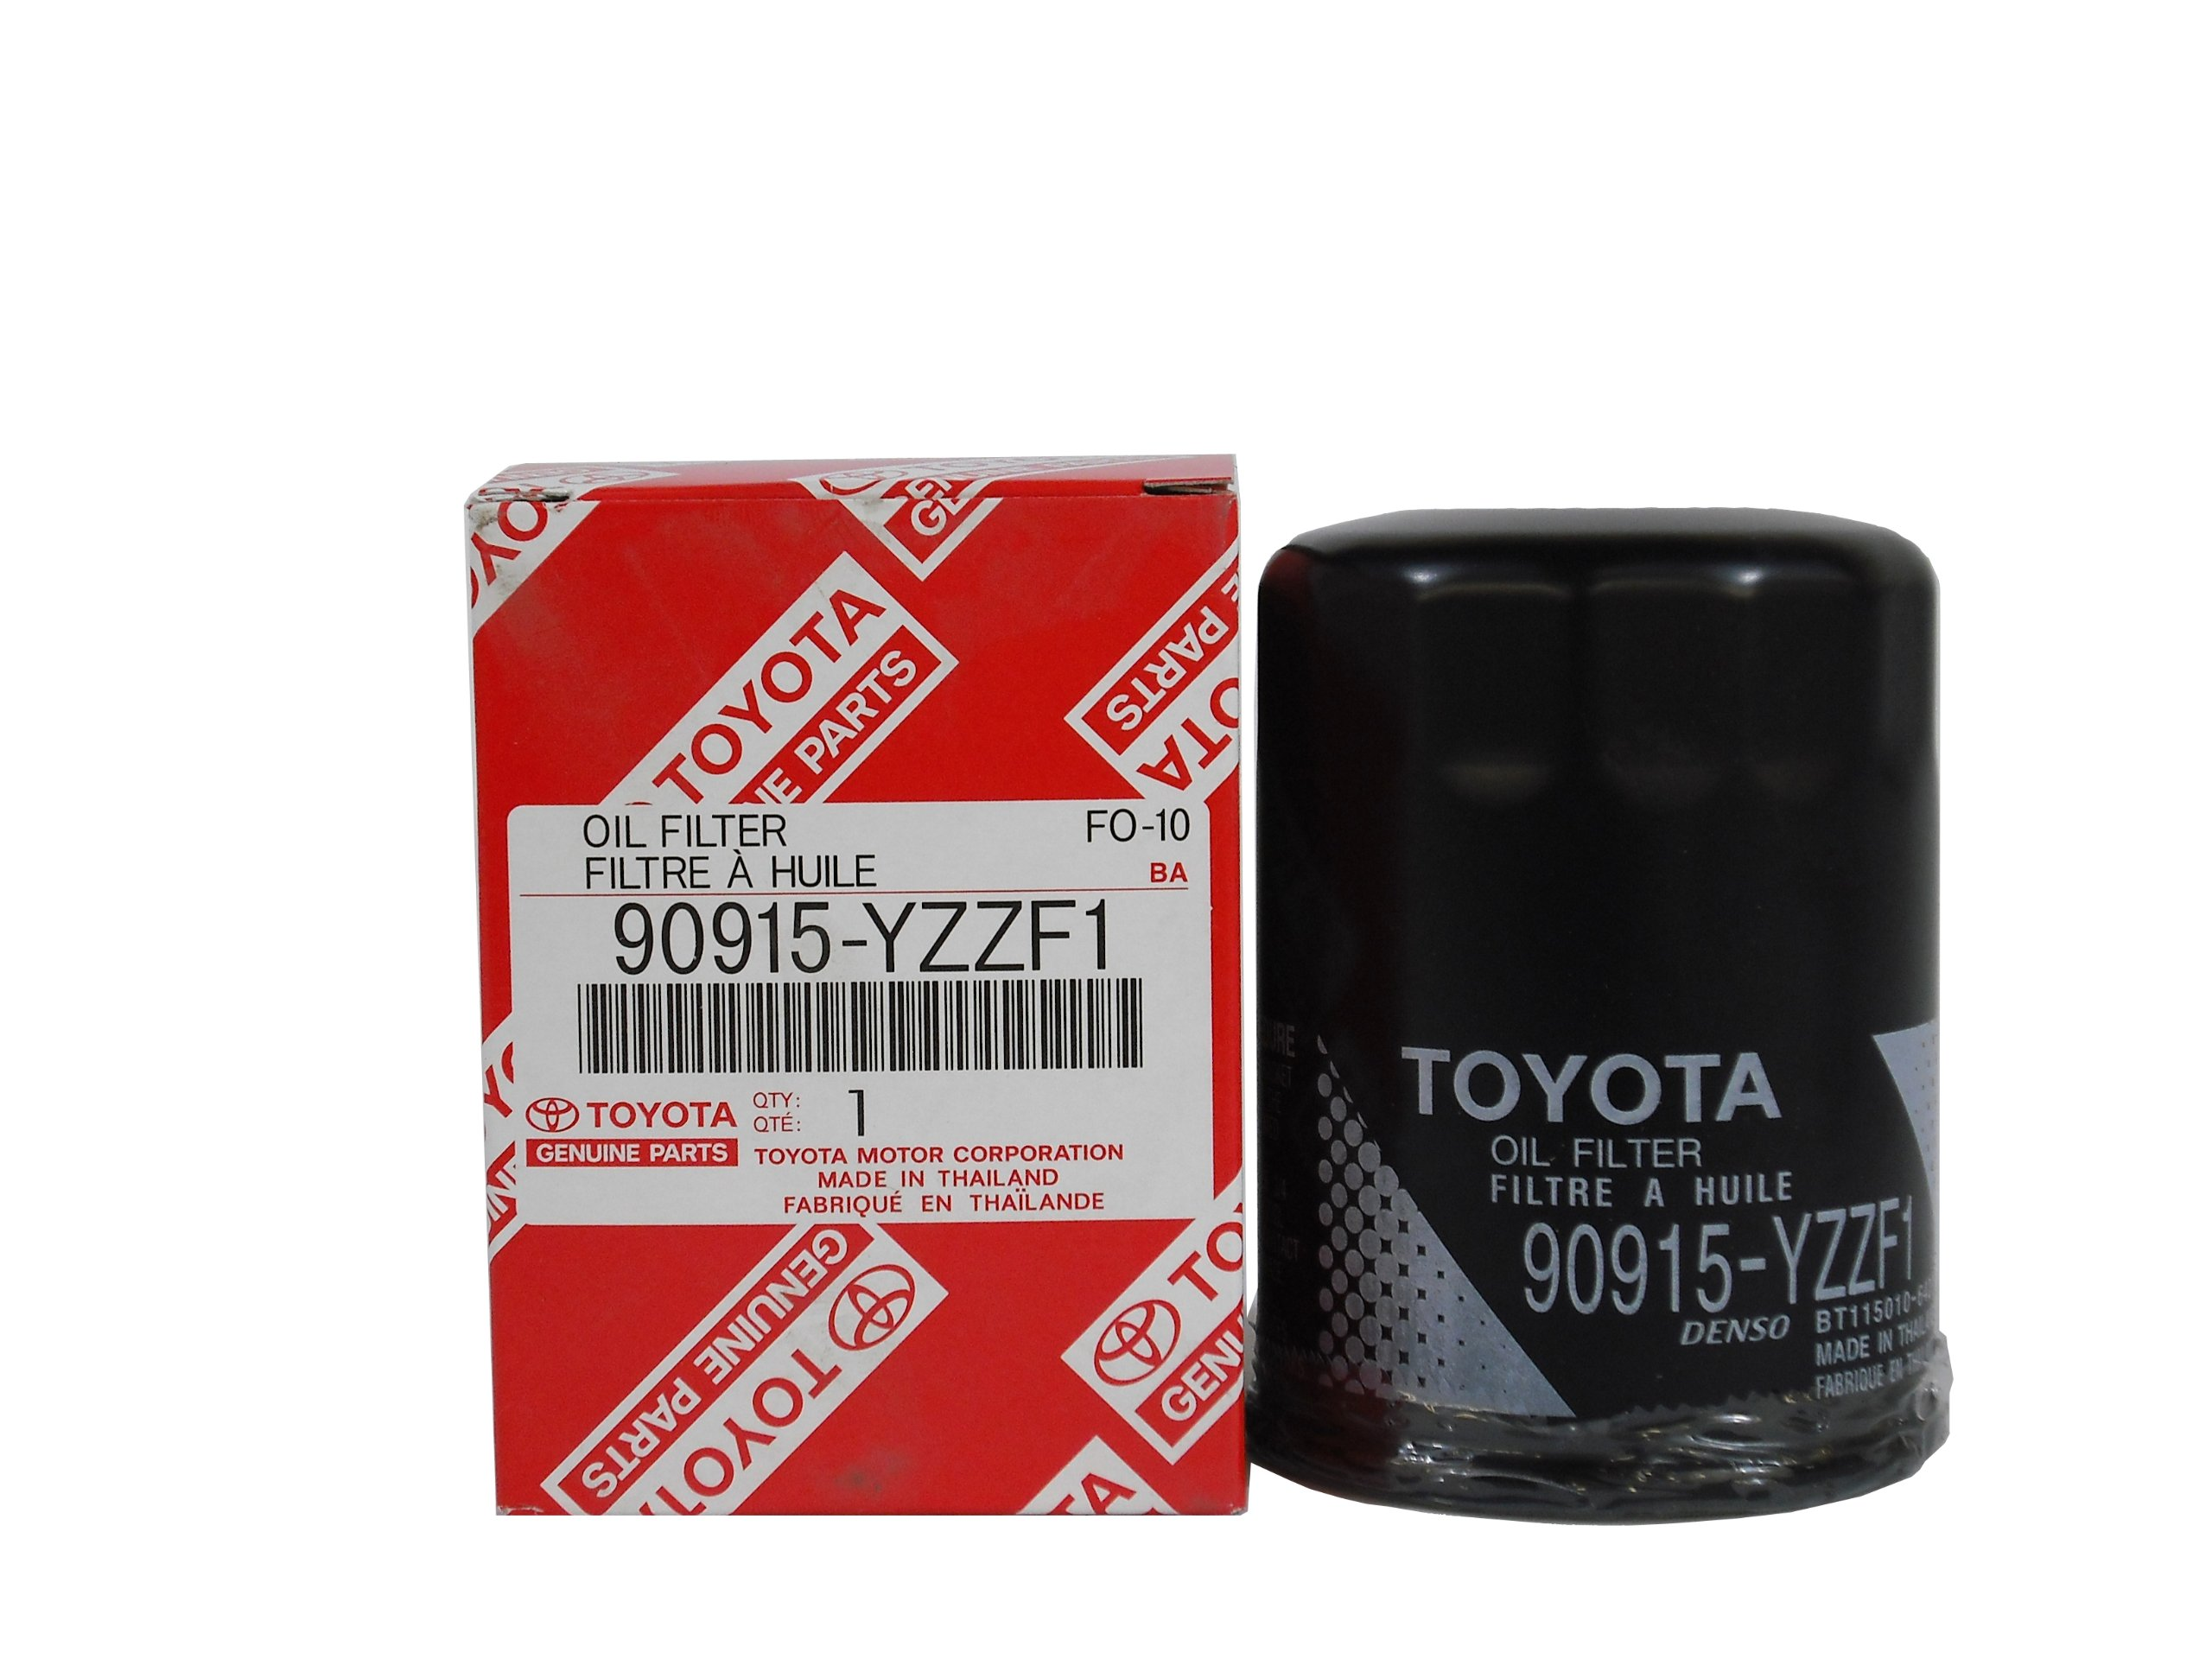 Toyota Genuine Parts 90915-YZZF1 Oil Filter